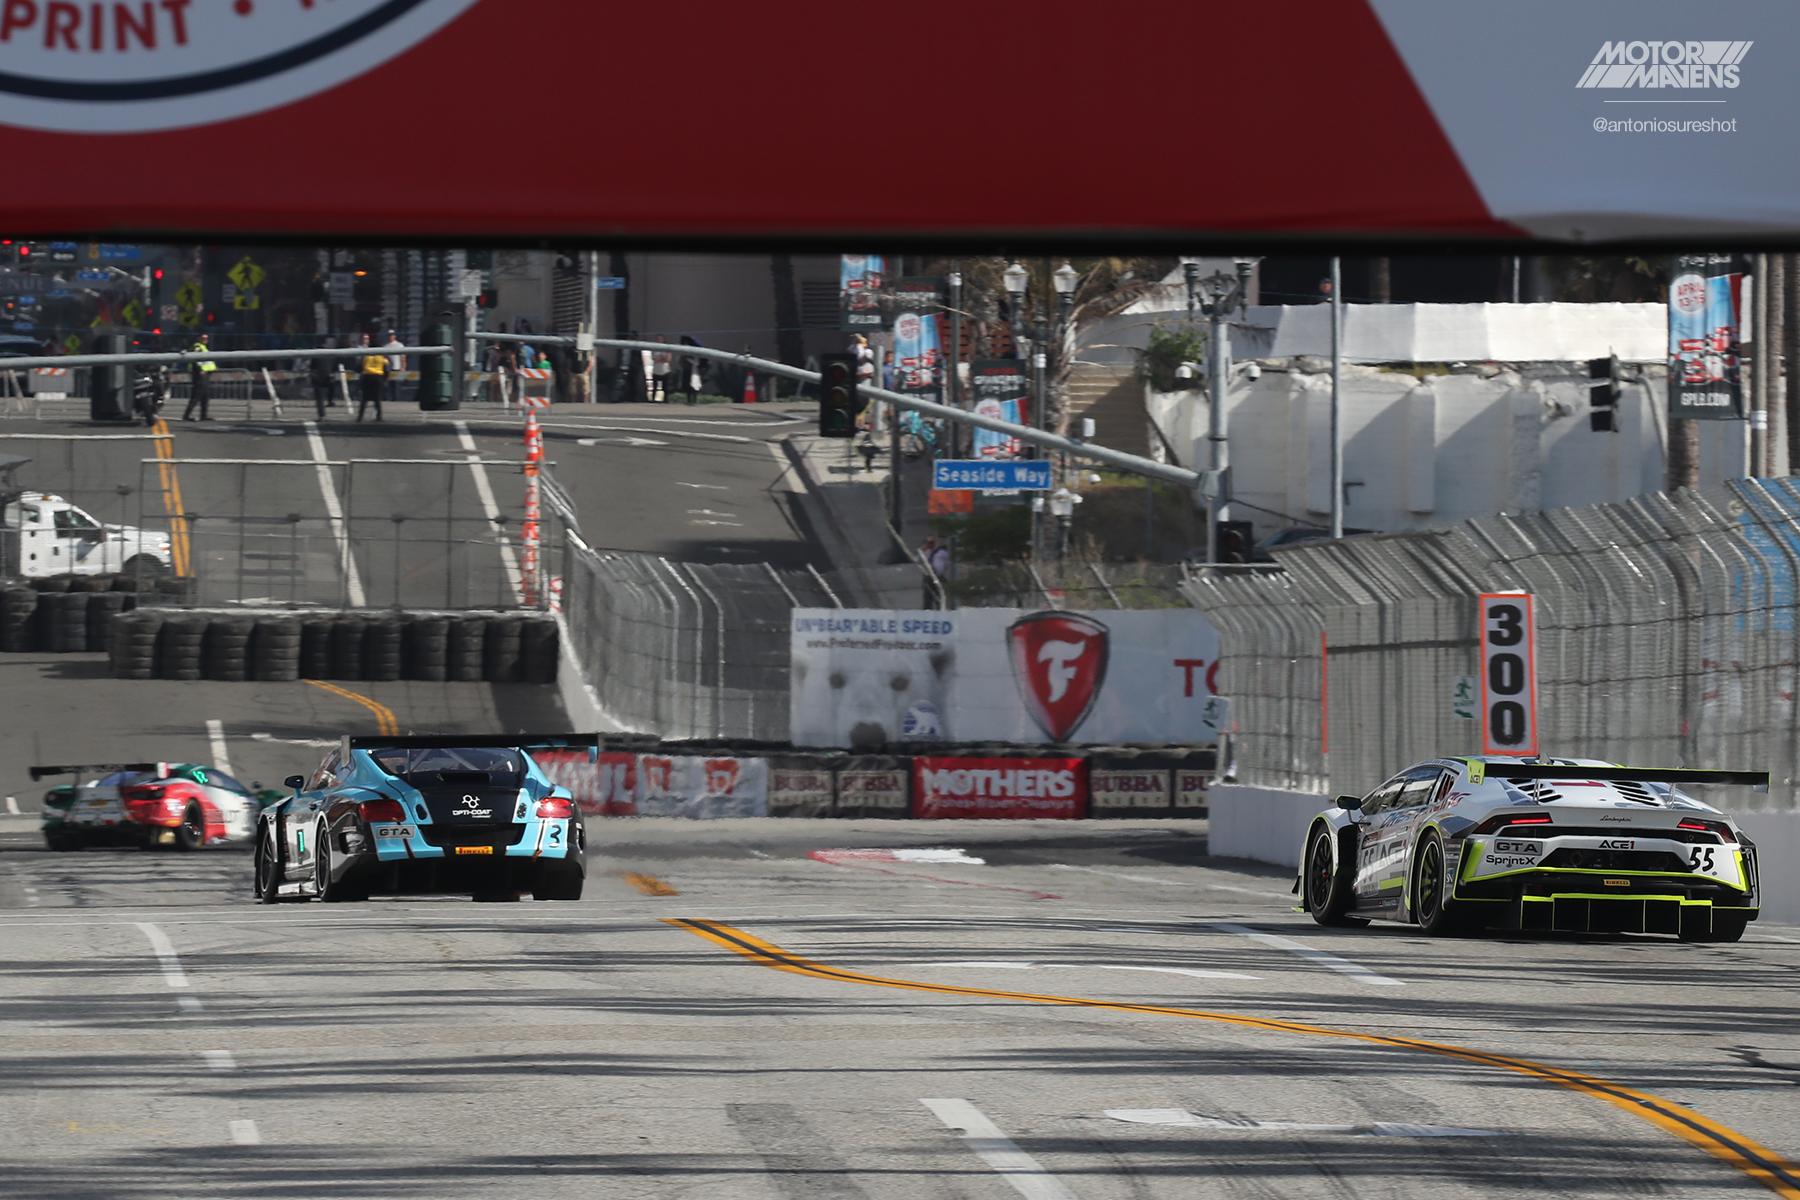 Lamborghini Huracan GT3, Pirelli World Challenge, Long Beach Grand Prix, Lamborghini, Huracan, Huracan GT3, Yuki Harata, Dream Racing